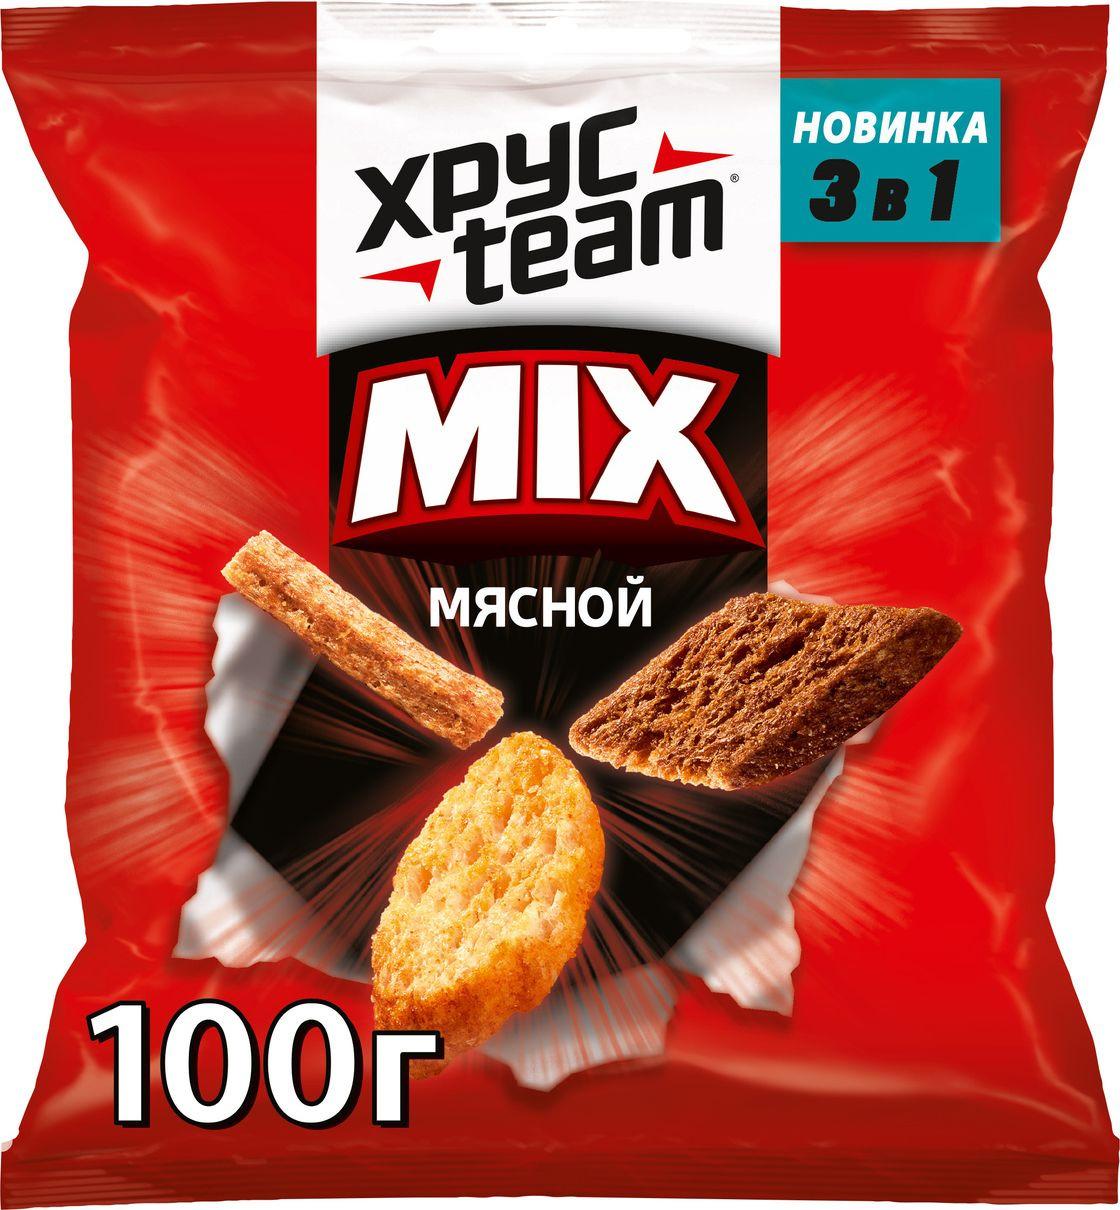 Сухарики Хрусteam Mix Мясной, 100 г хрусteam твистеr сухарики бекон 45 г